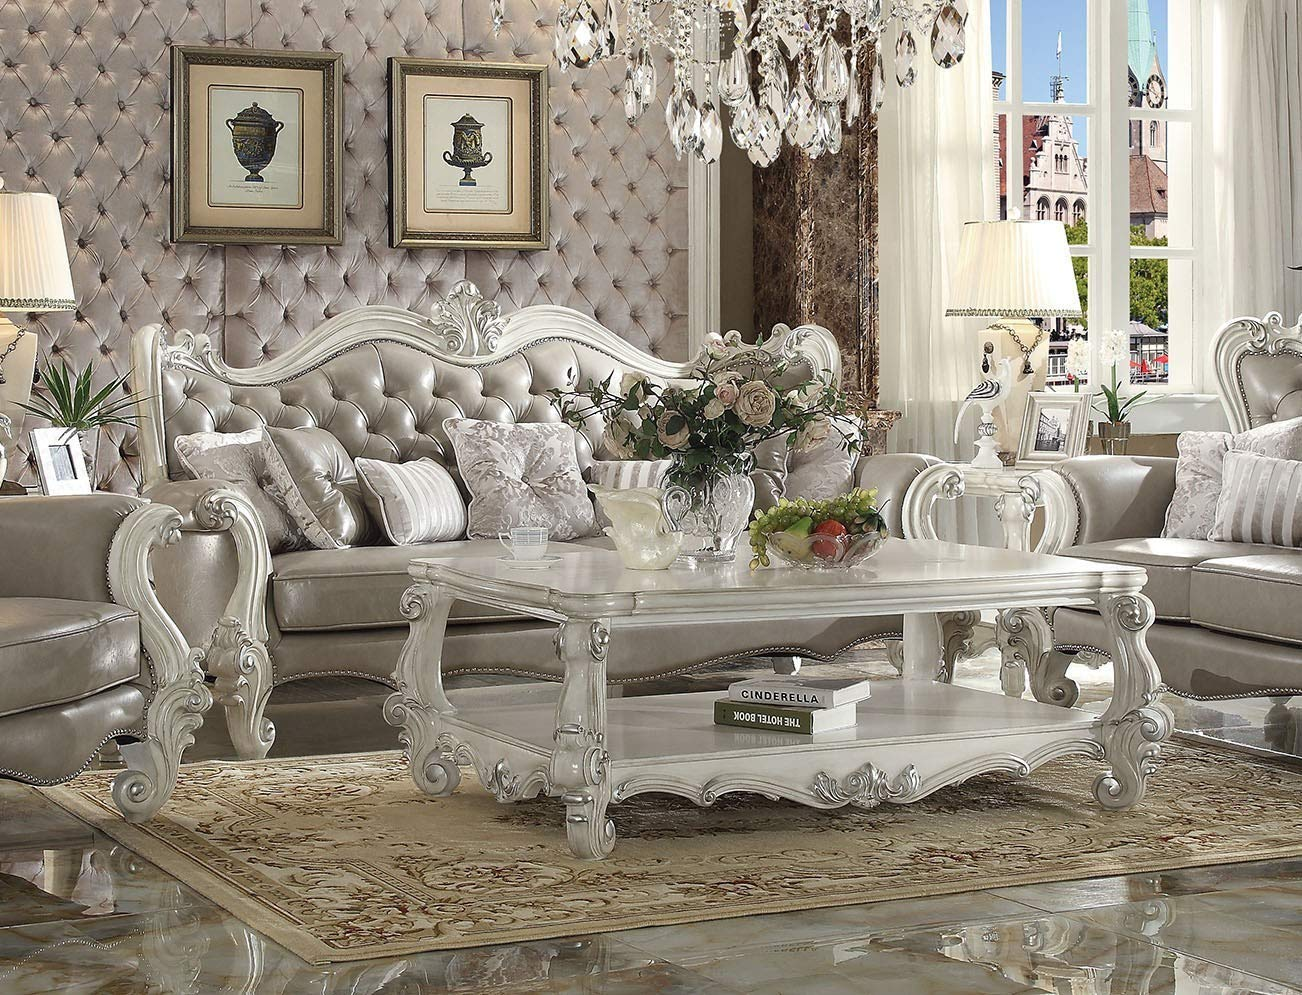 Amazon.com: Esofastore Luxurious Living Room Furniture 3pc ...